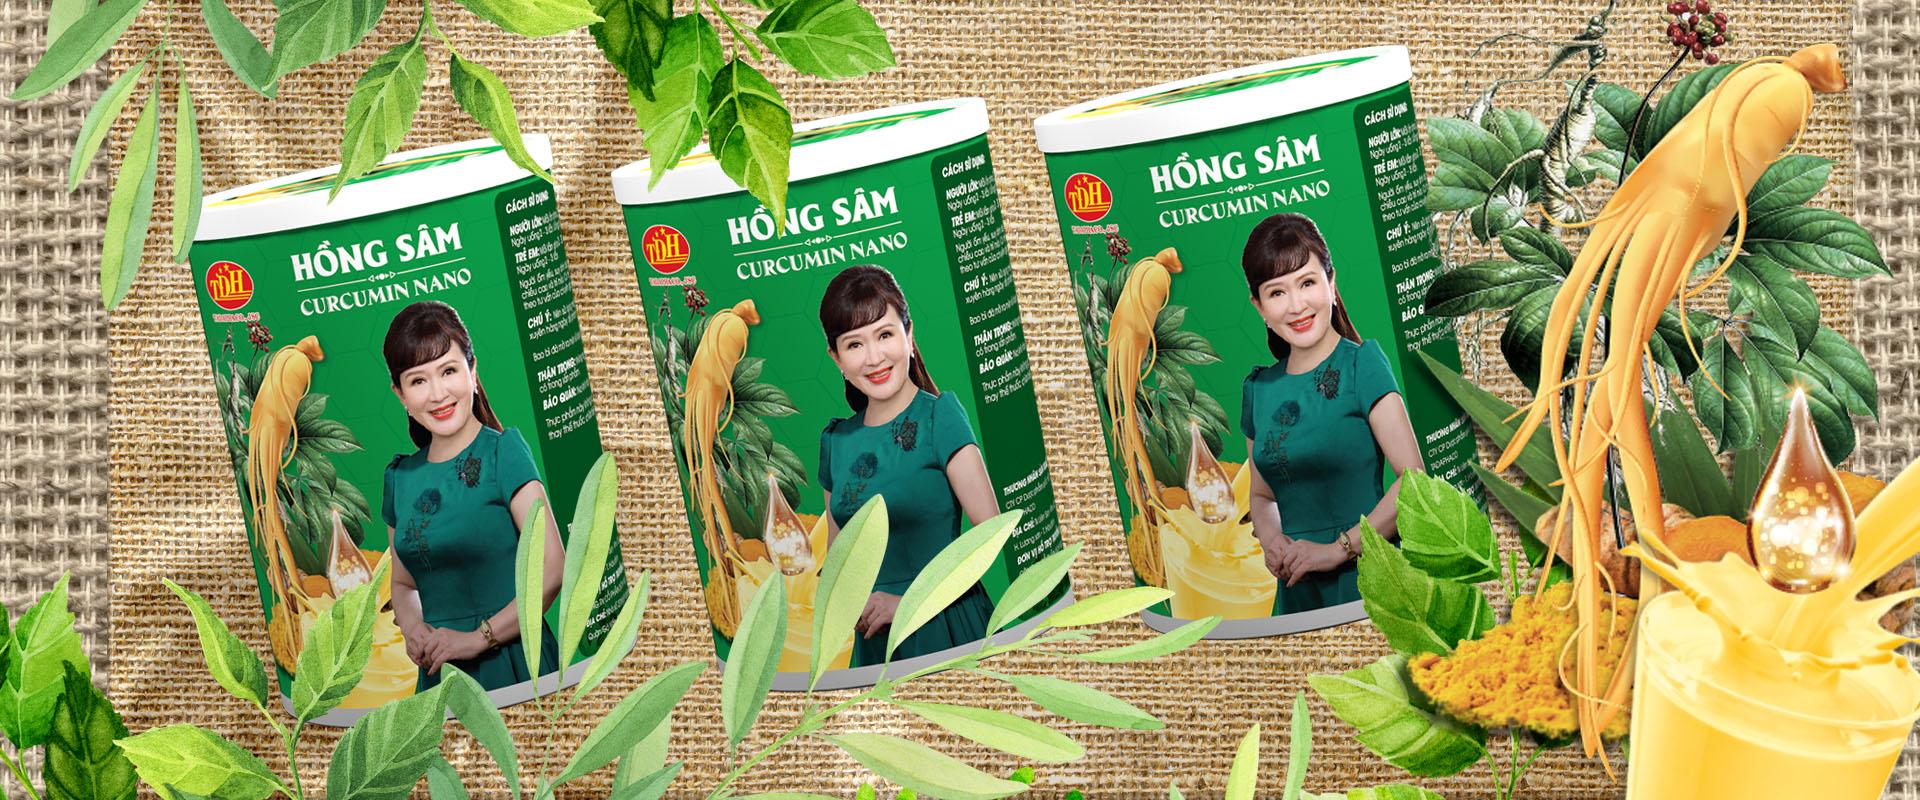 hong-sam-curcumin-nano-anh-8